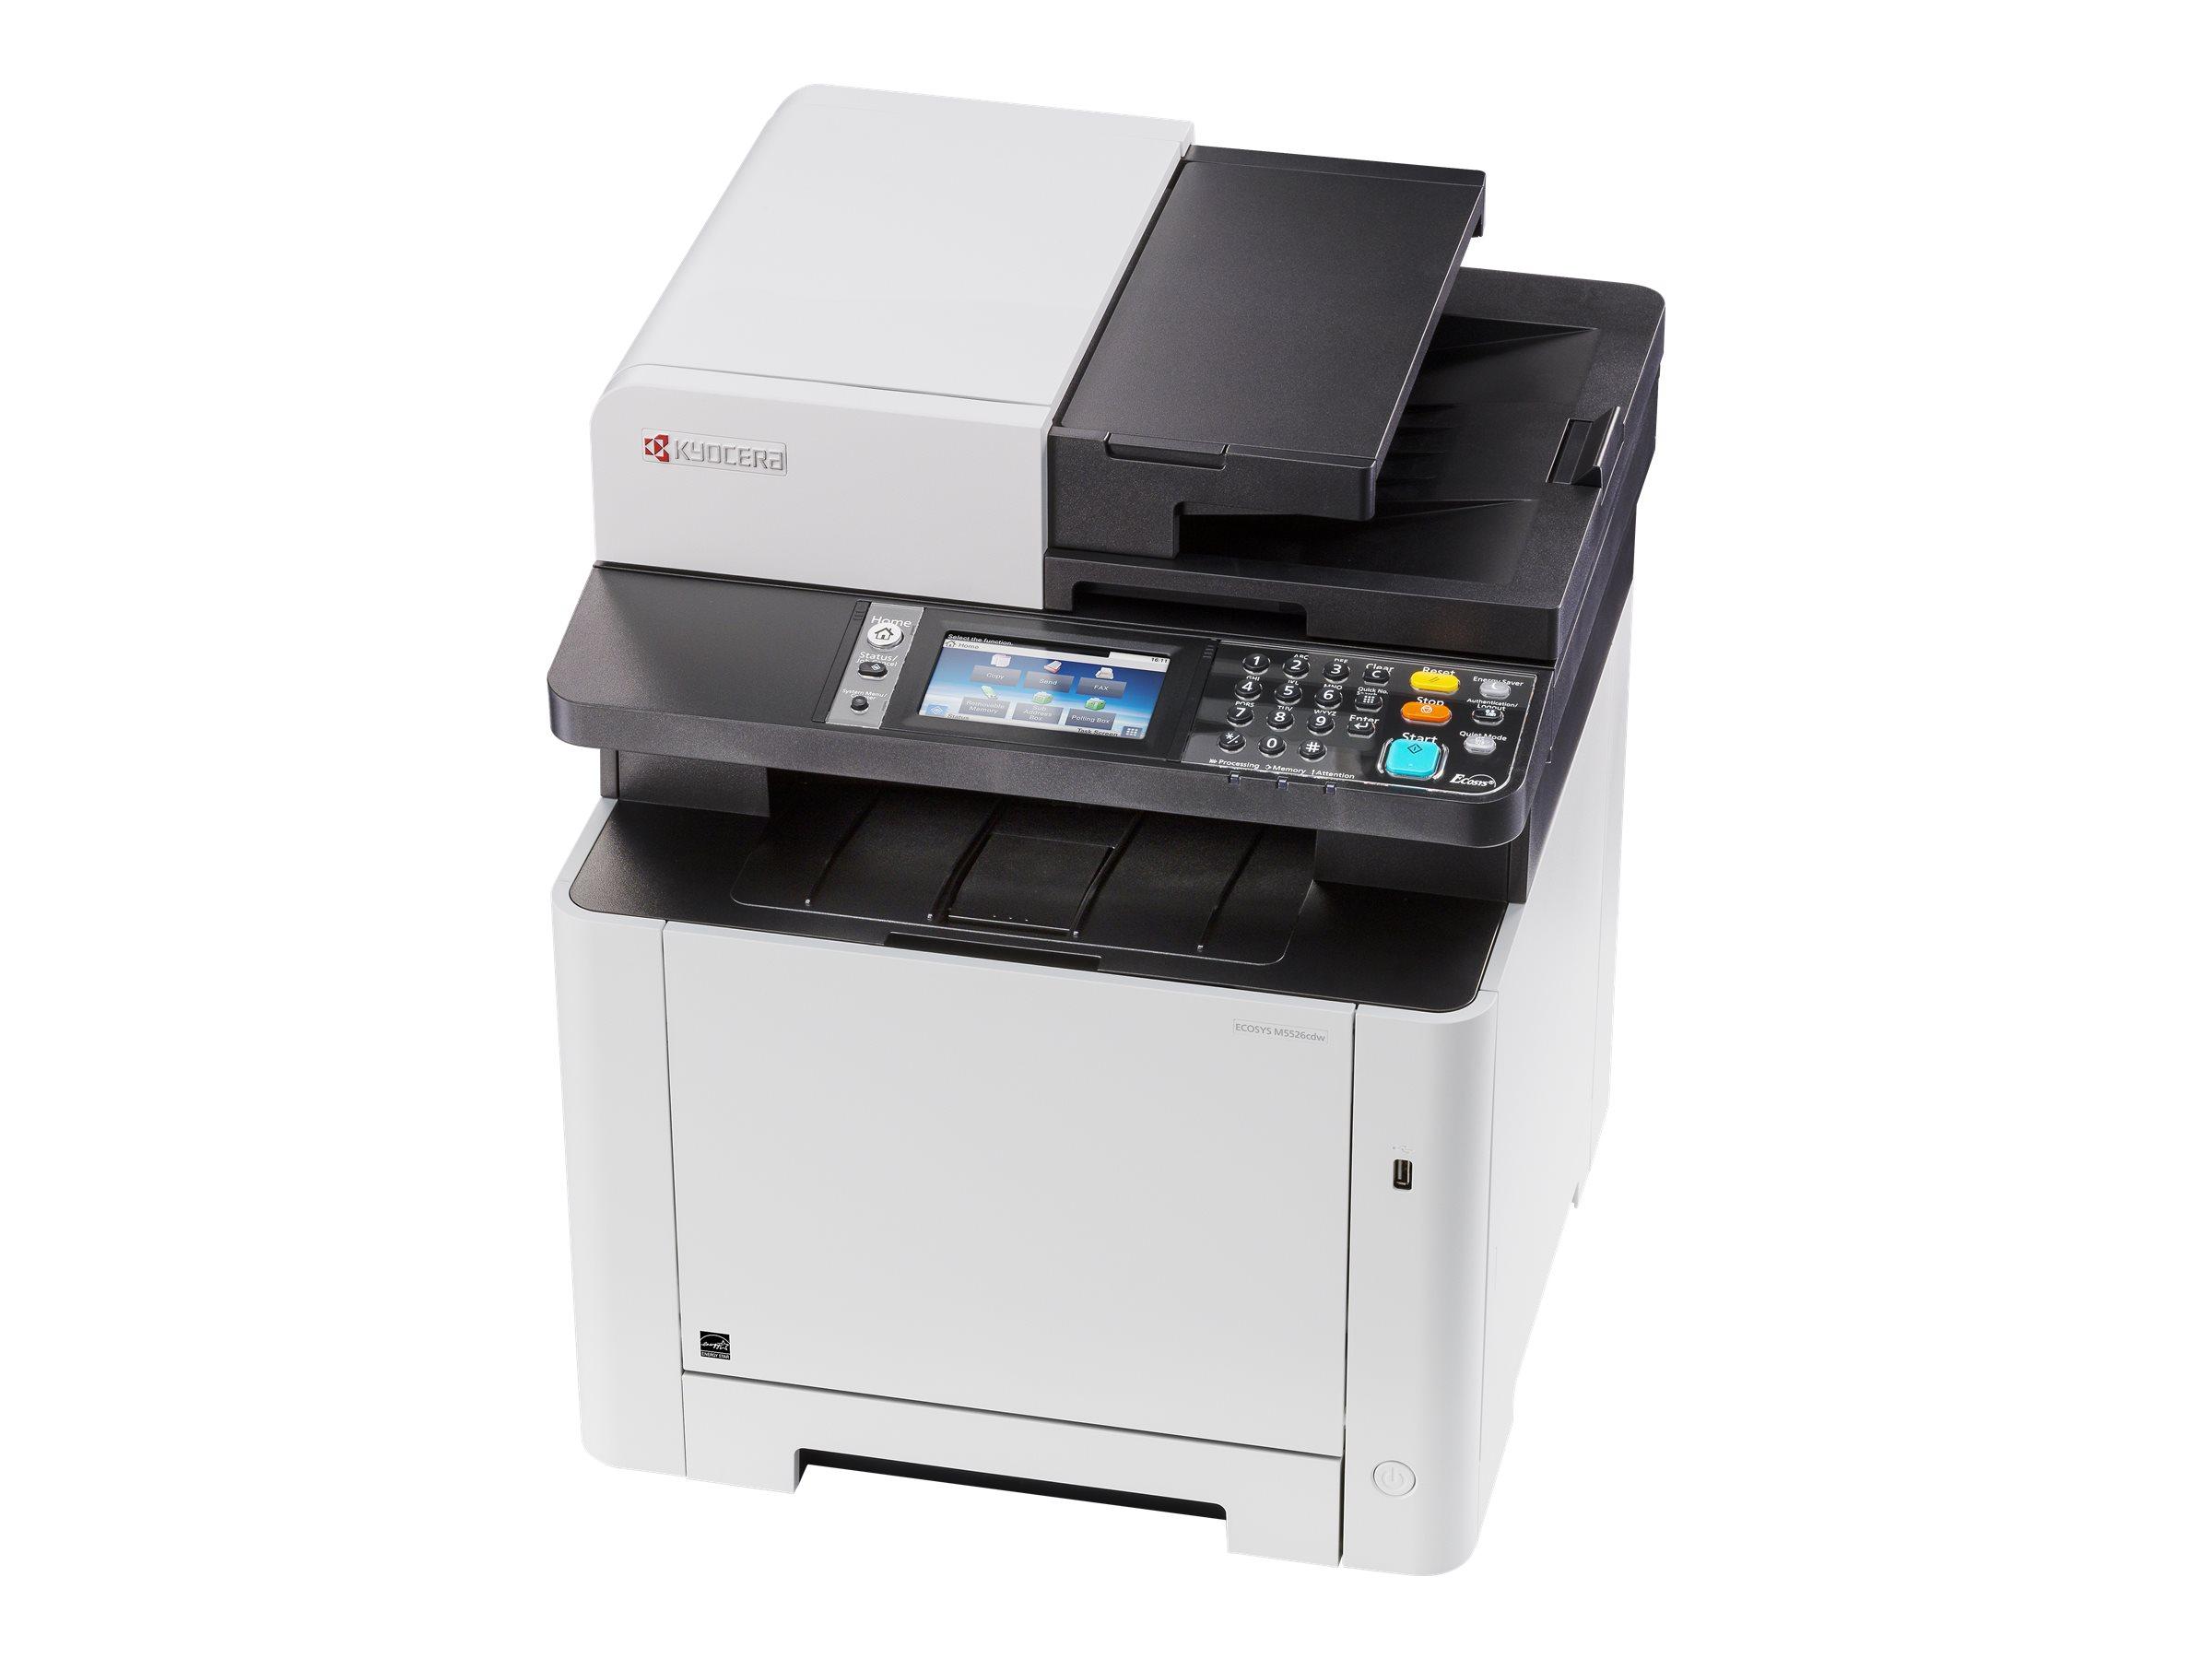 Kyocera ECOSYS M5526cdw/KL3 - Multifunktionsdrucker - Farbe - Laser - A4 (210 x 297 mm)